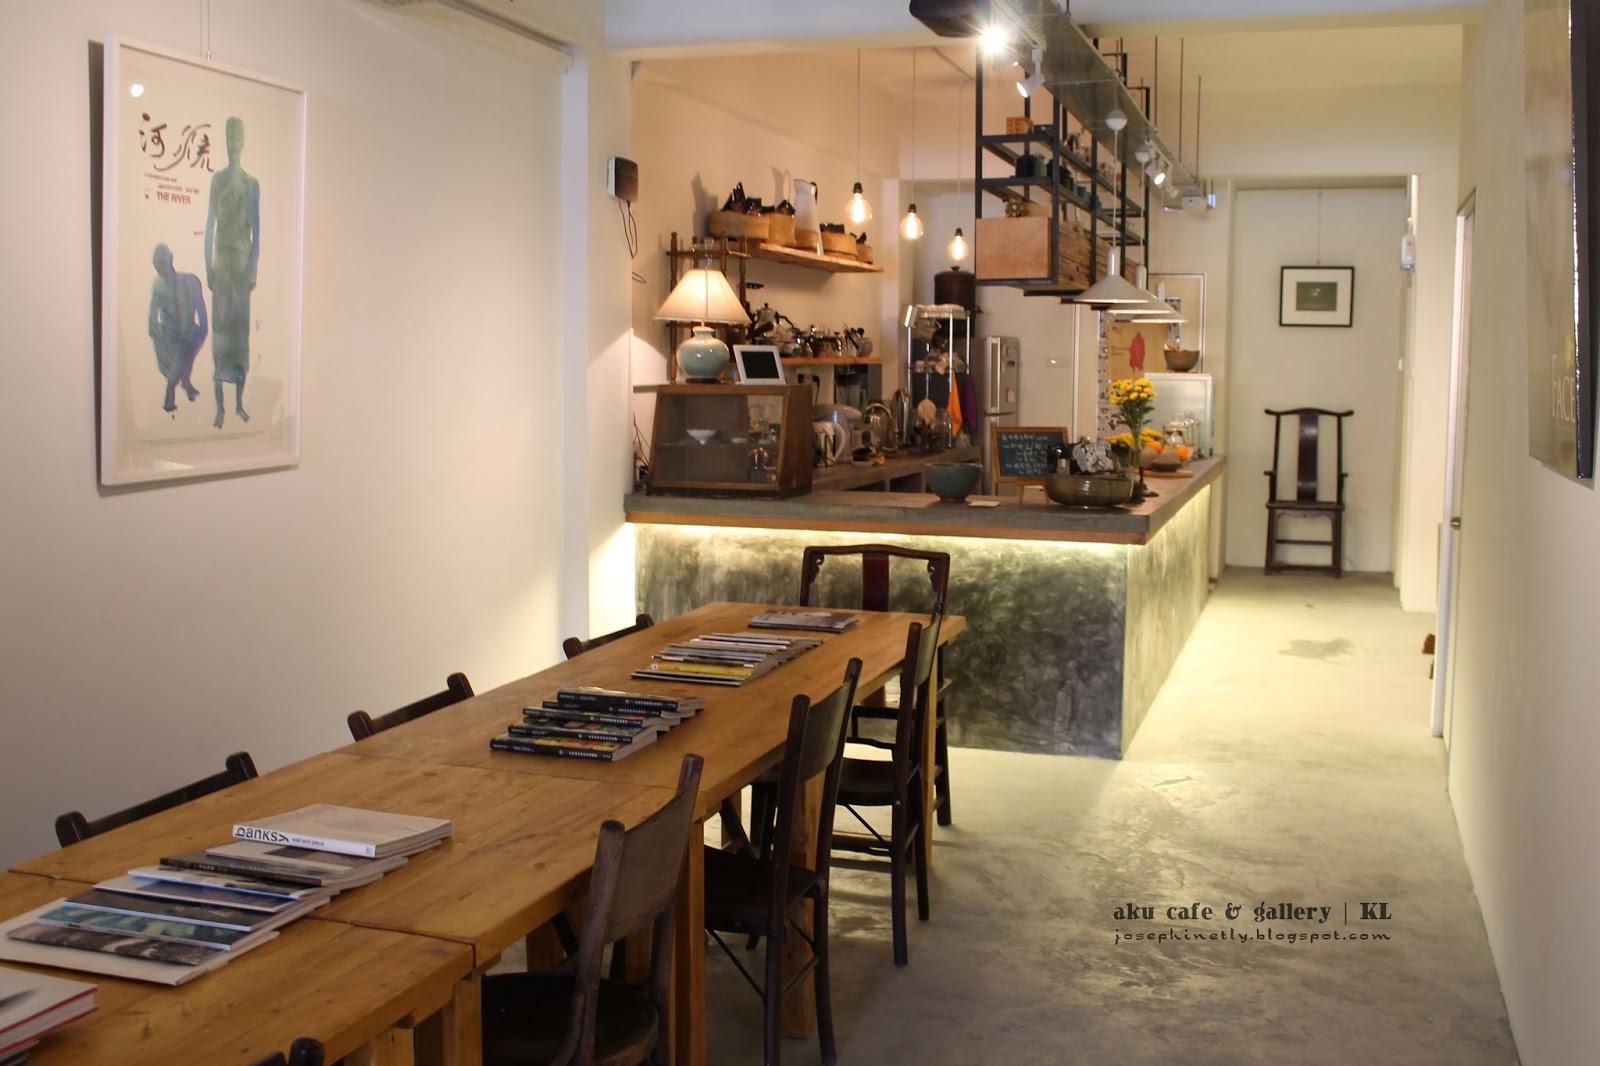 Aku Cafe and Gallery